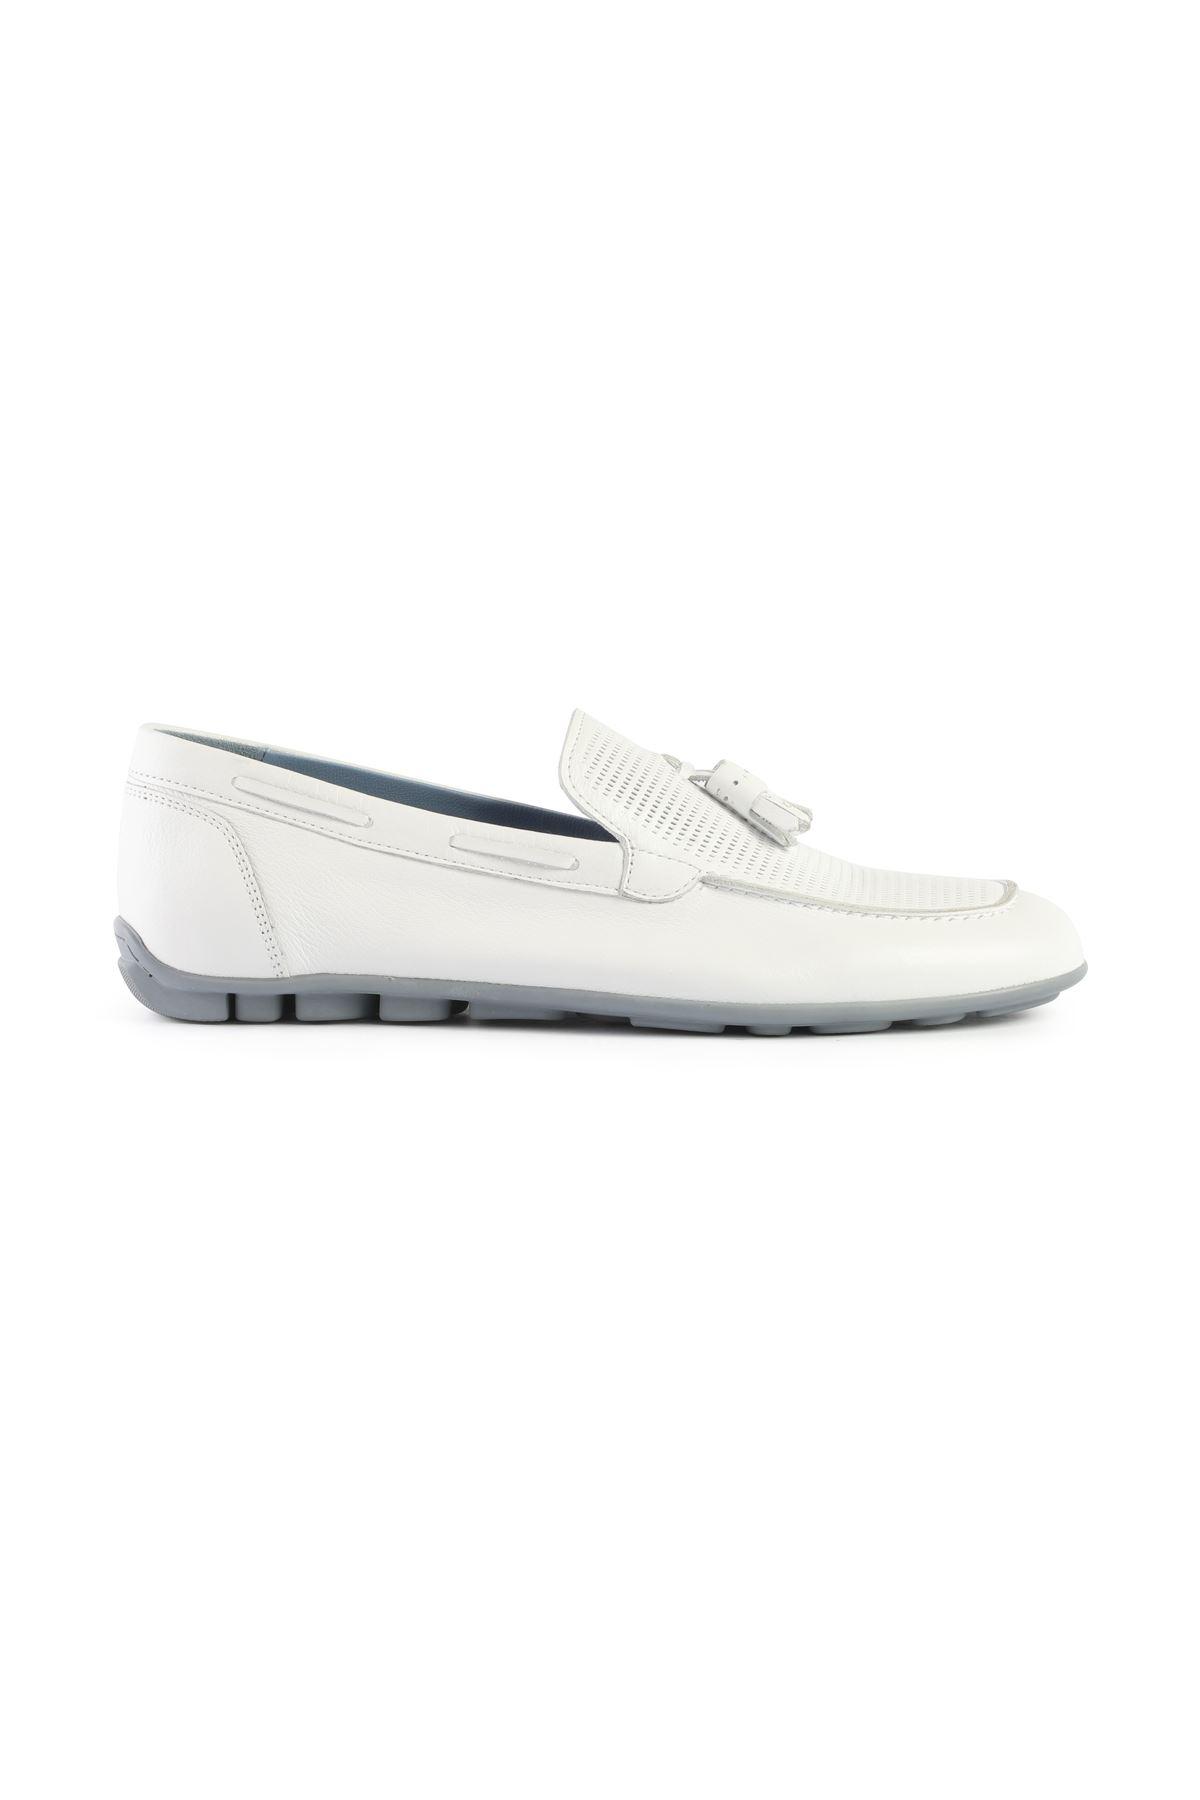 Libero L3408 White Loafer Shoes